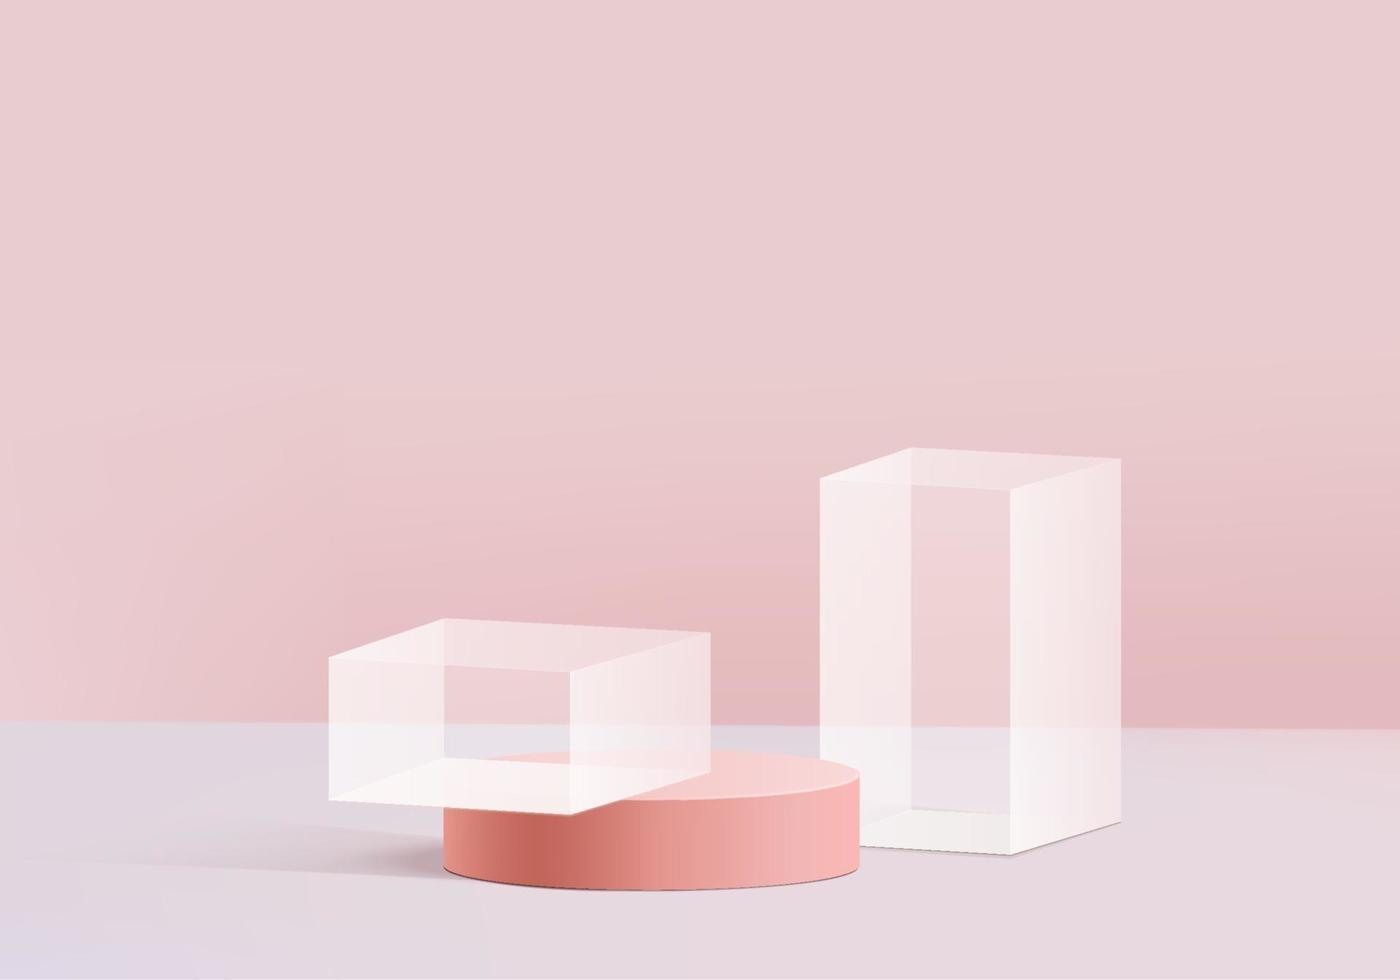 Modern background platform with with pink glass modern. Background vector 3d rendering crystal modern podium platform. stand show cosmetic product. Stage showcase on pedestal modern 3d studio platform